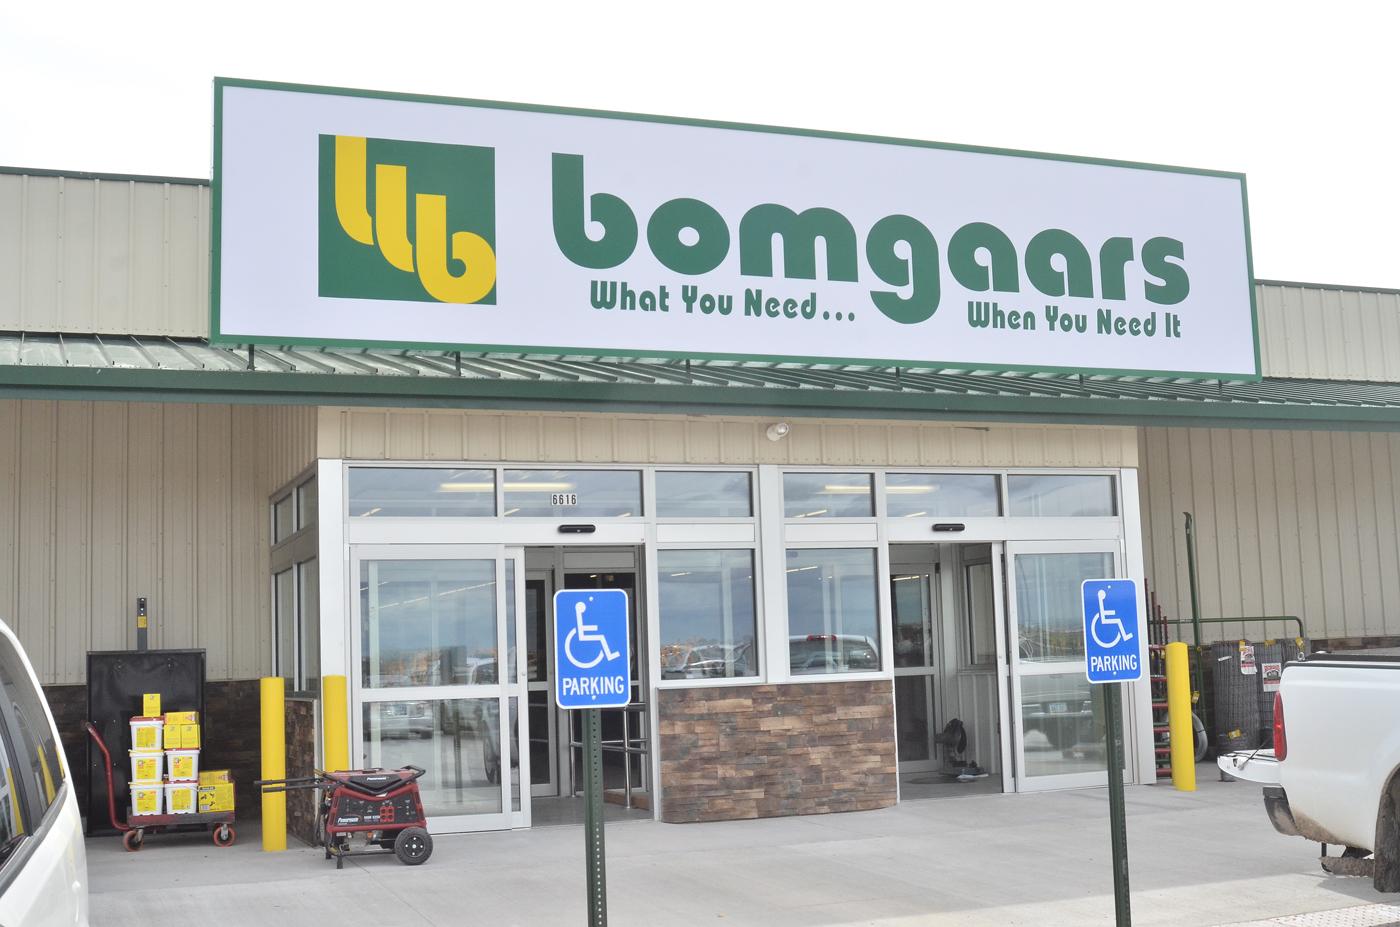 Bomgaars Supply